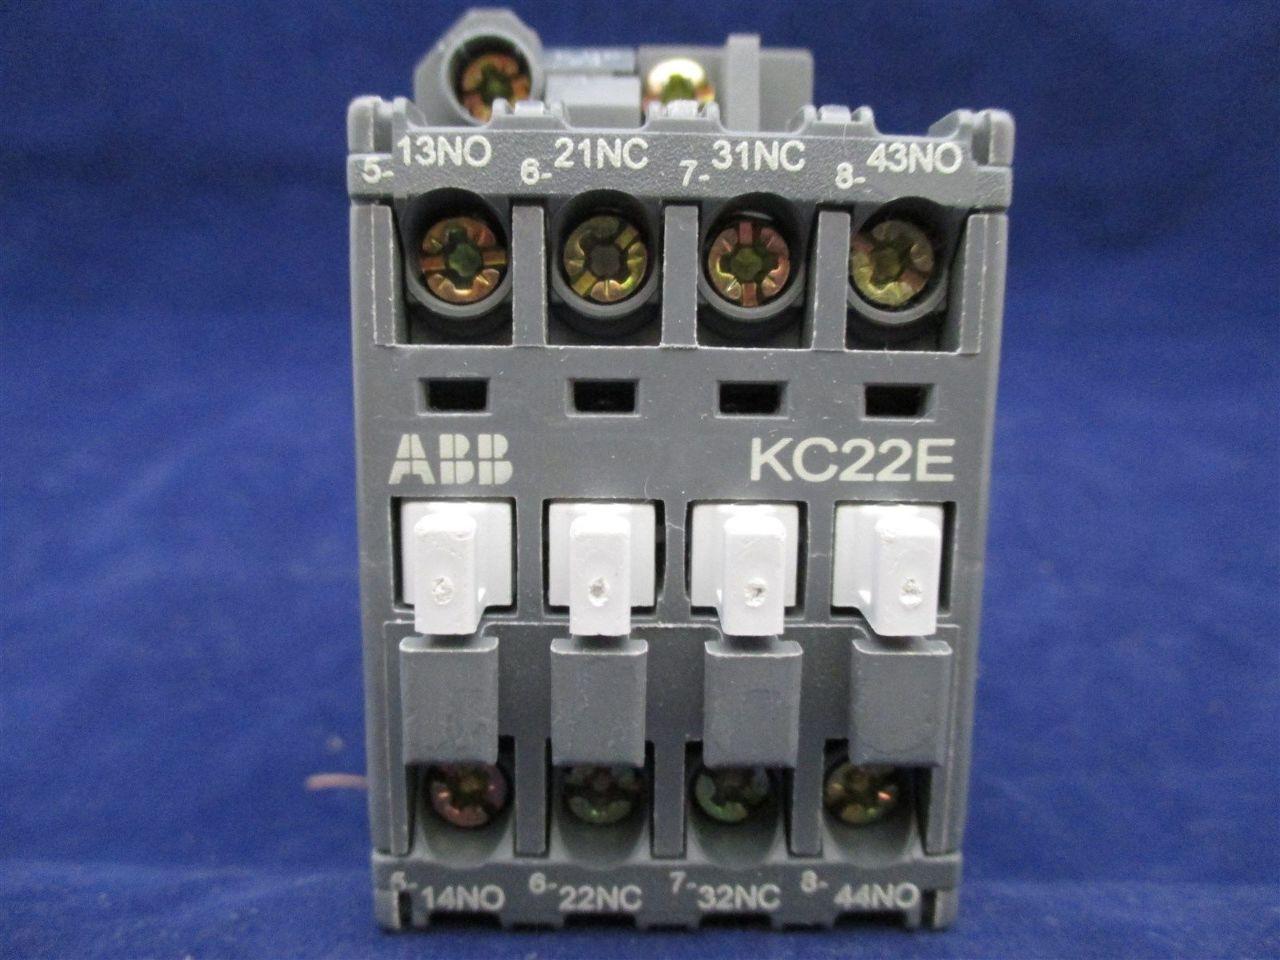 Abb Kc22e 01 Contactor New Process Industrial Surplus